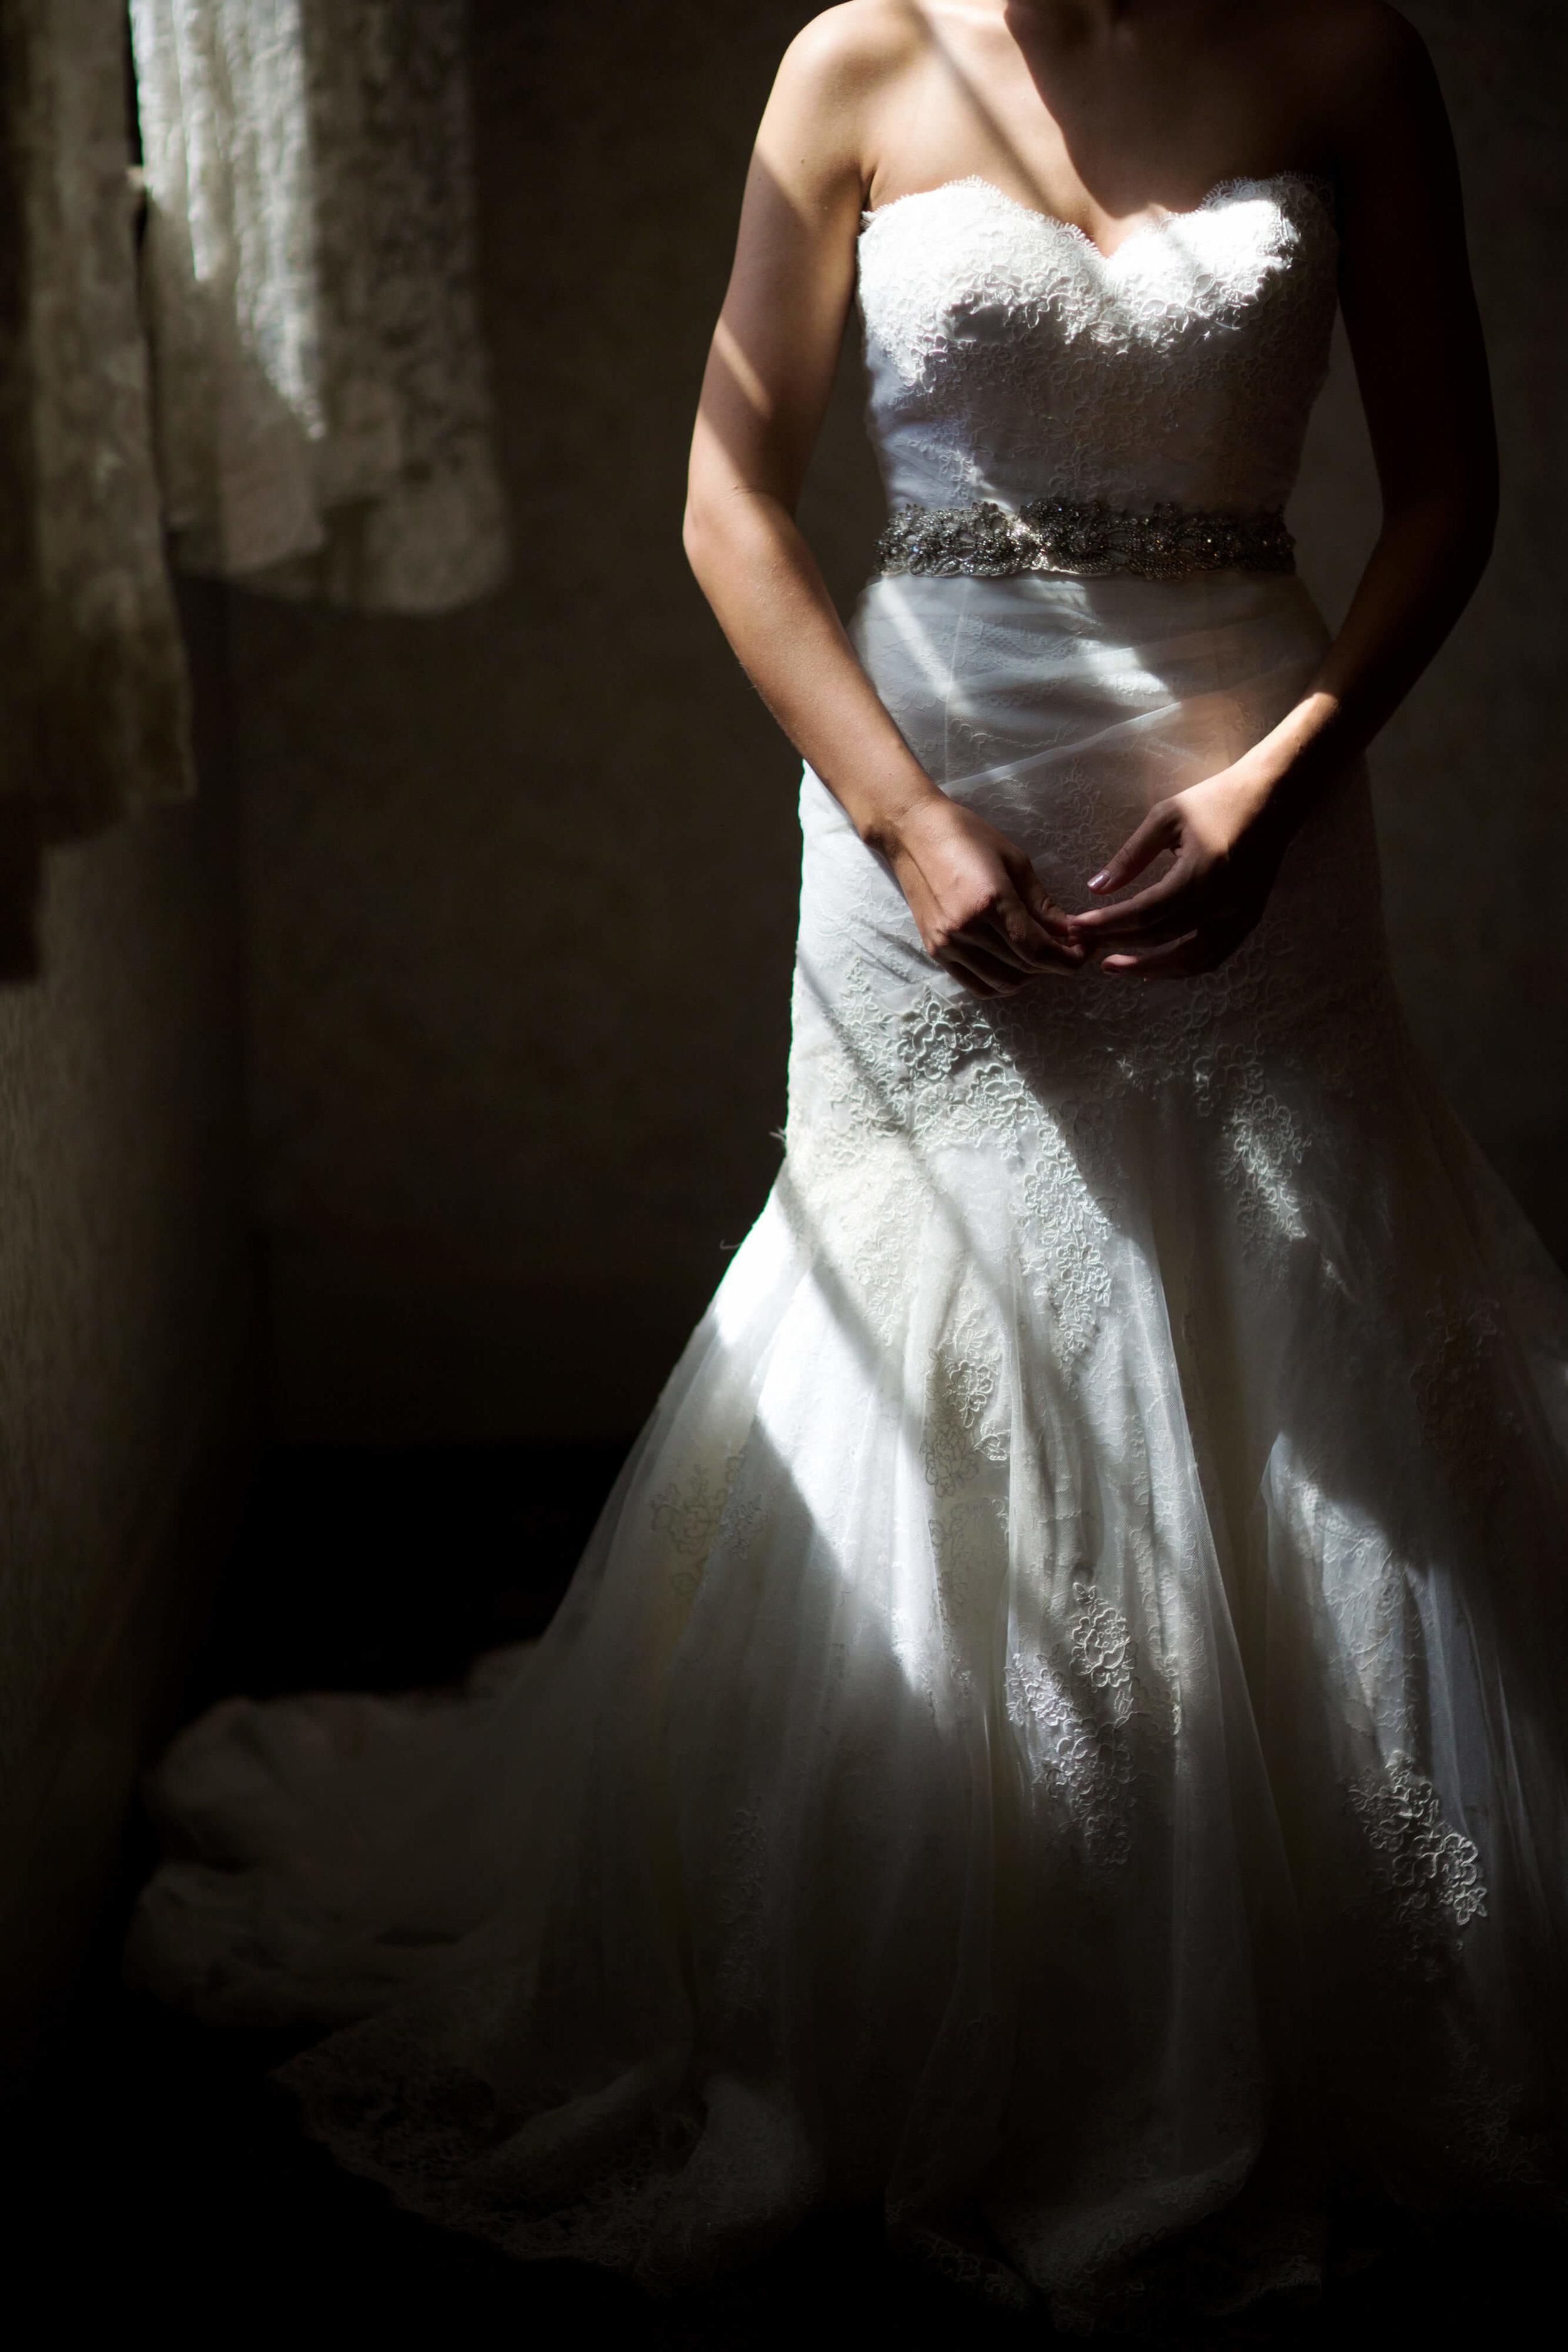 bride standing in the window light | Minnesota wedding photographer Studio KH wedding dress details | wedding blog | Sixpence Events 70 Ways to Photograph Your Wedding Dress.jpg